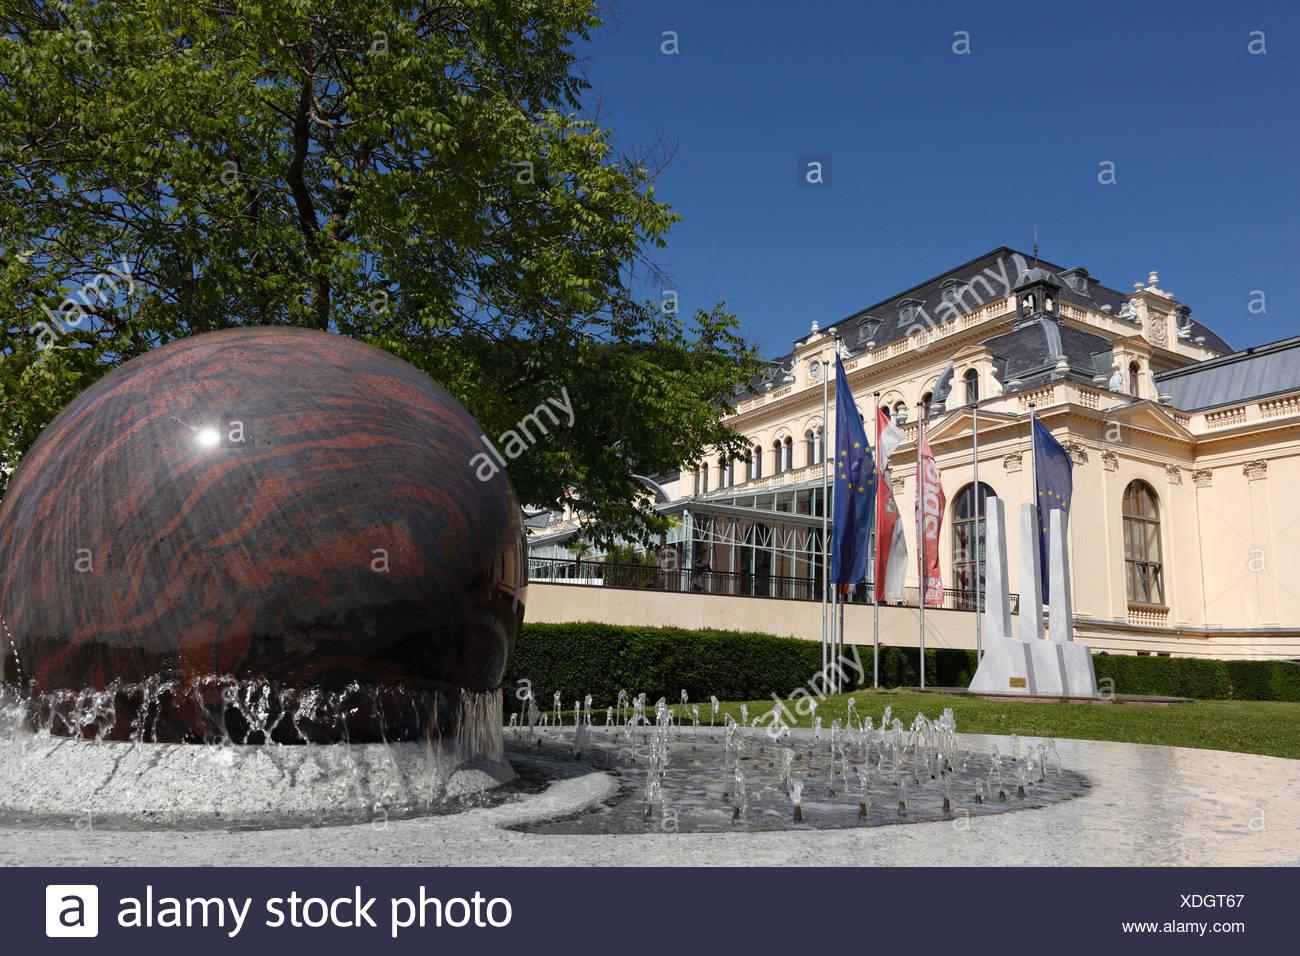 casino in austria